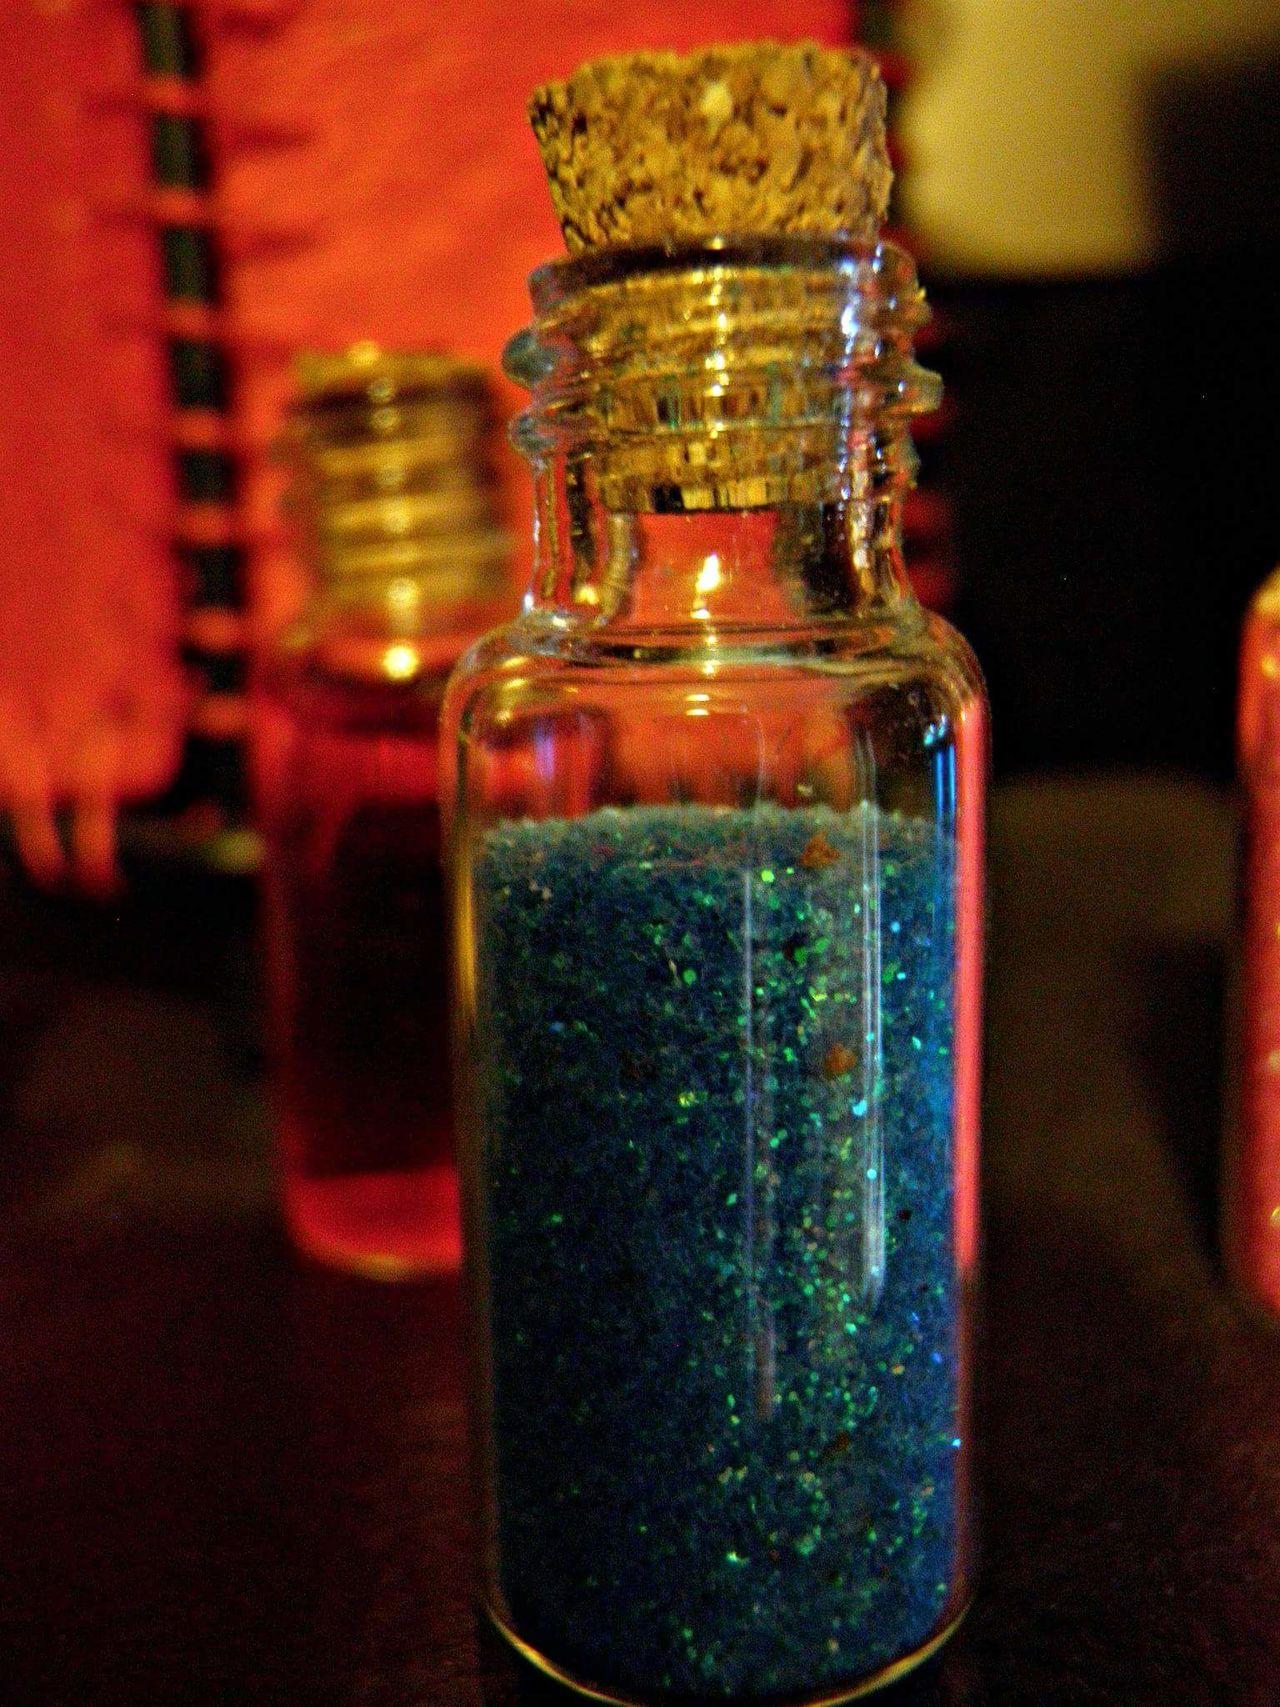 Bottle No People Indoors  Sparkles Mini Bottles Tiny Cork Close-up Blue